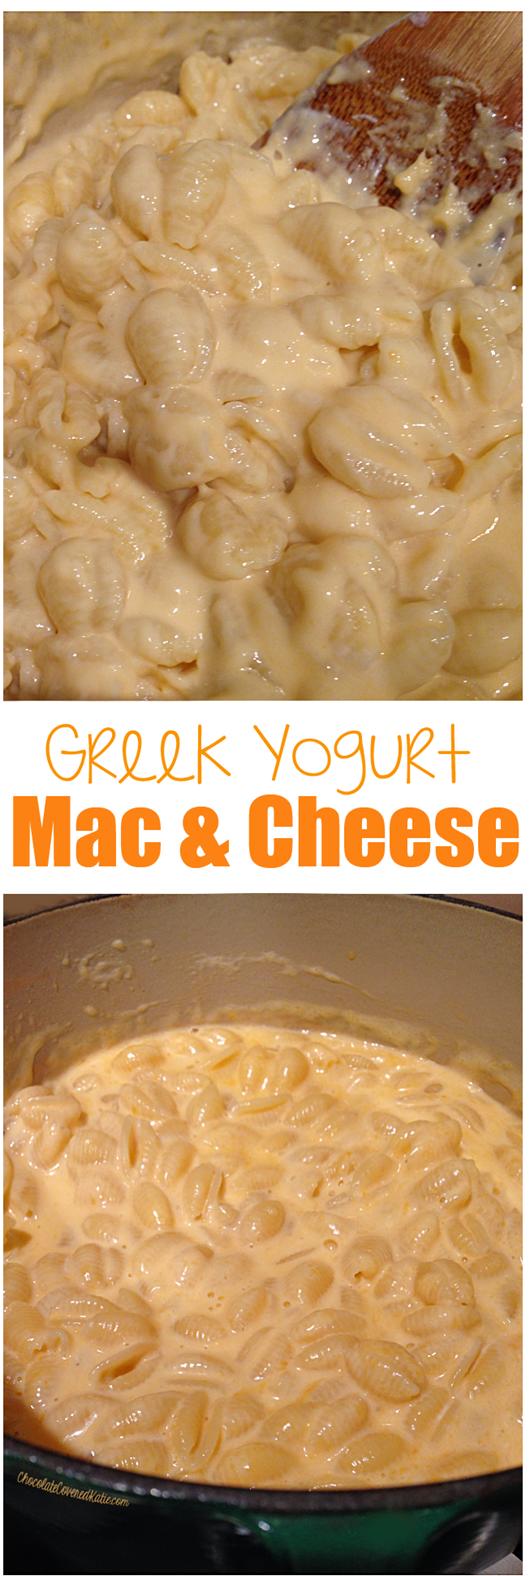 The creamiest healthy mac & cheese recipe - from @choccoveredkt... uses Greek yogurt in place of heavy cream. Recipe: http://chocolatecoveredkatie.com/2015/03/05/greek-yogurt-mac-cheese/